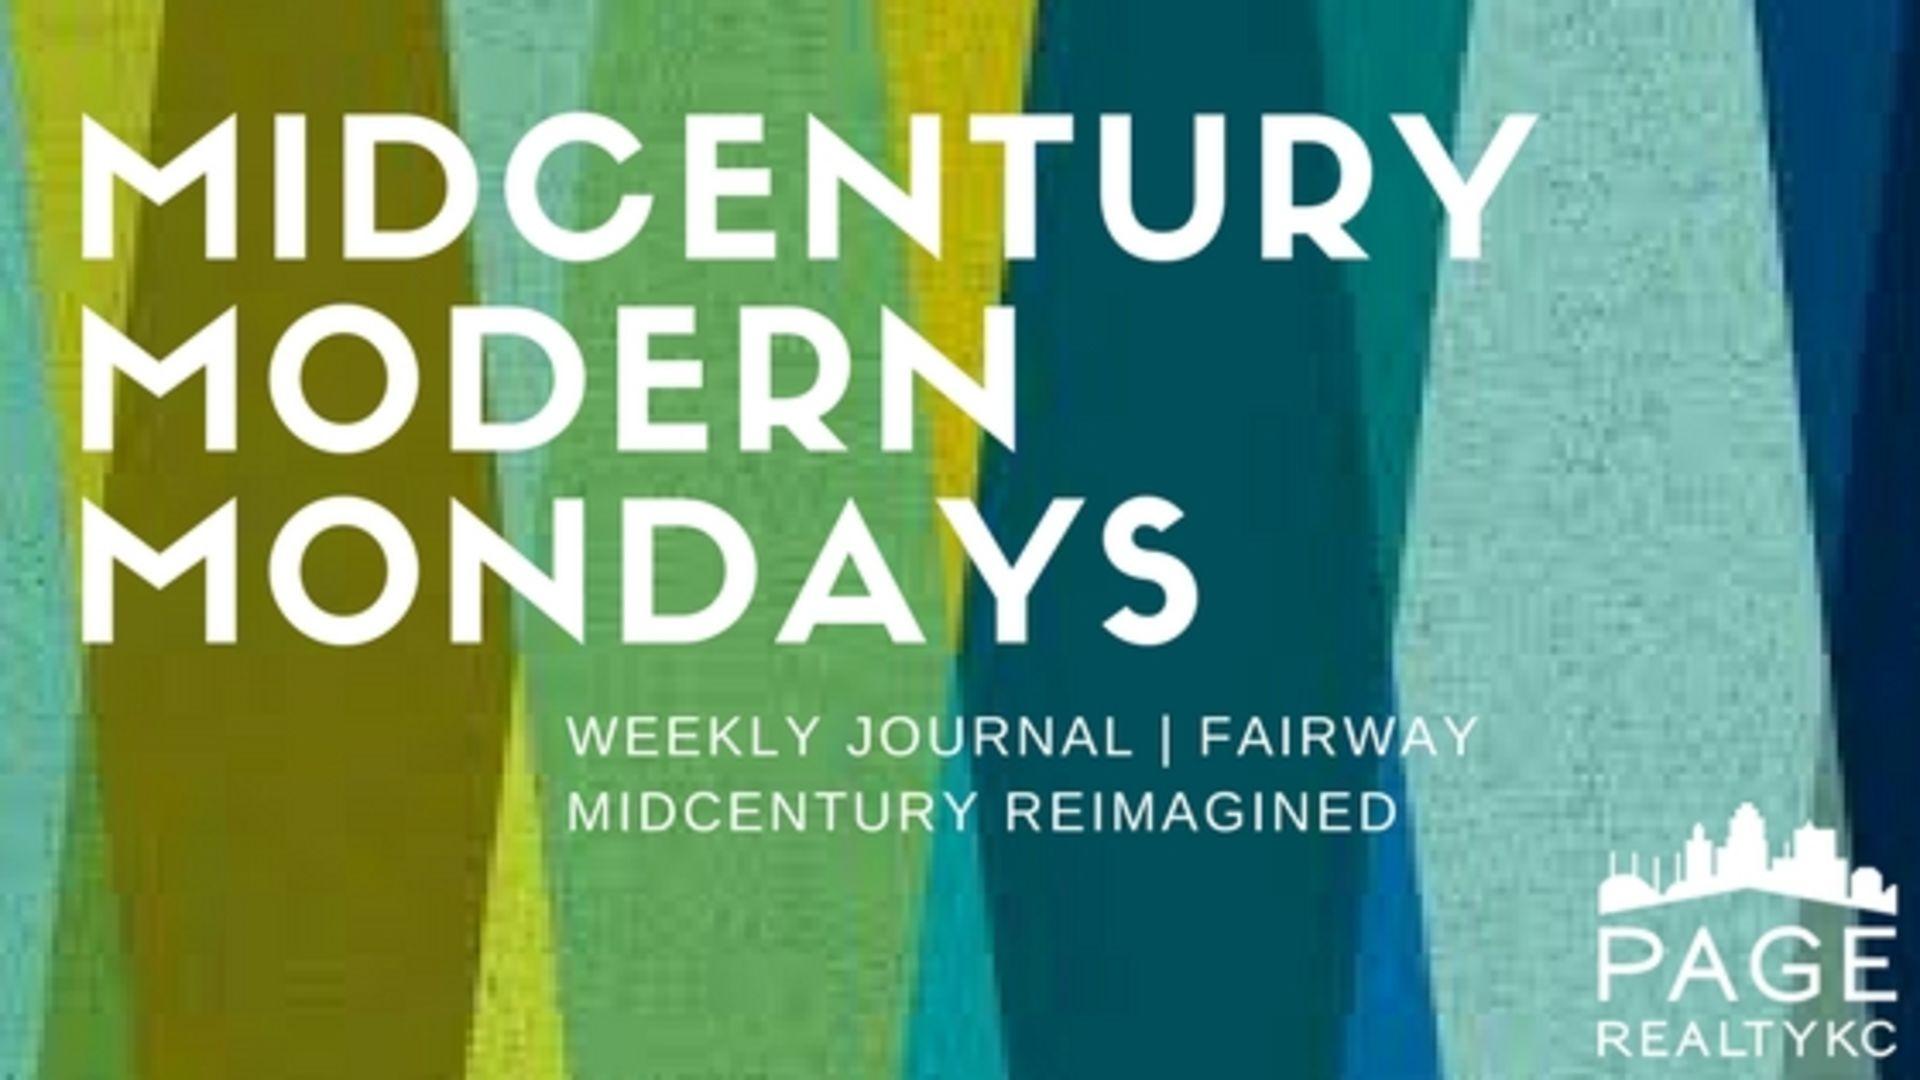 Midcentury Modern Monday August 7th